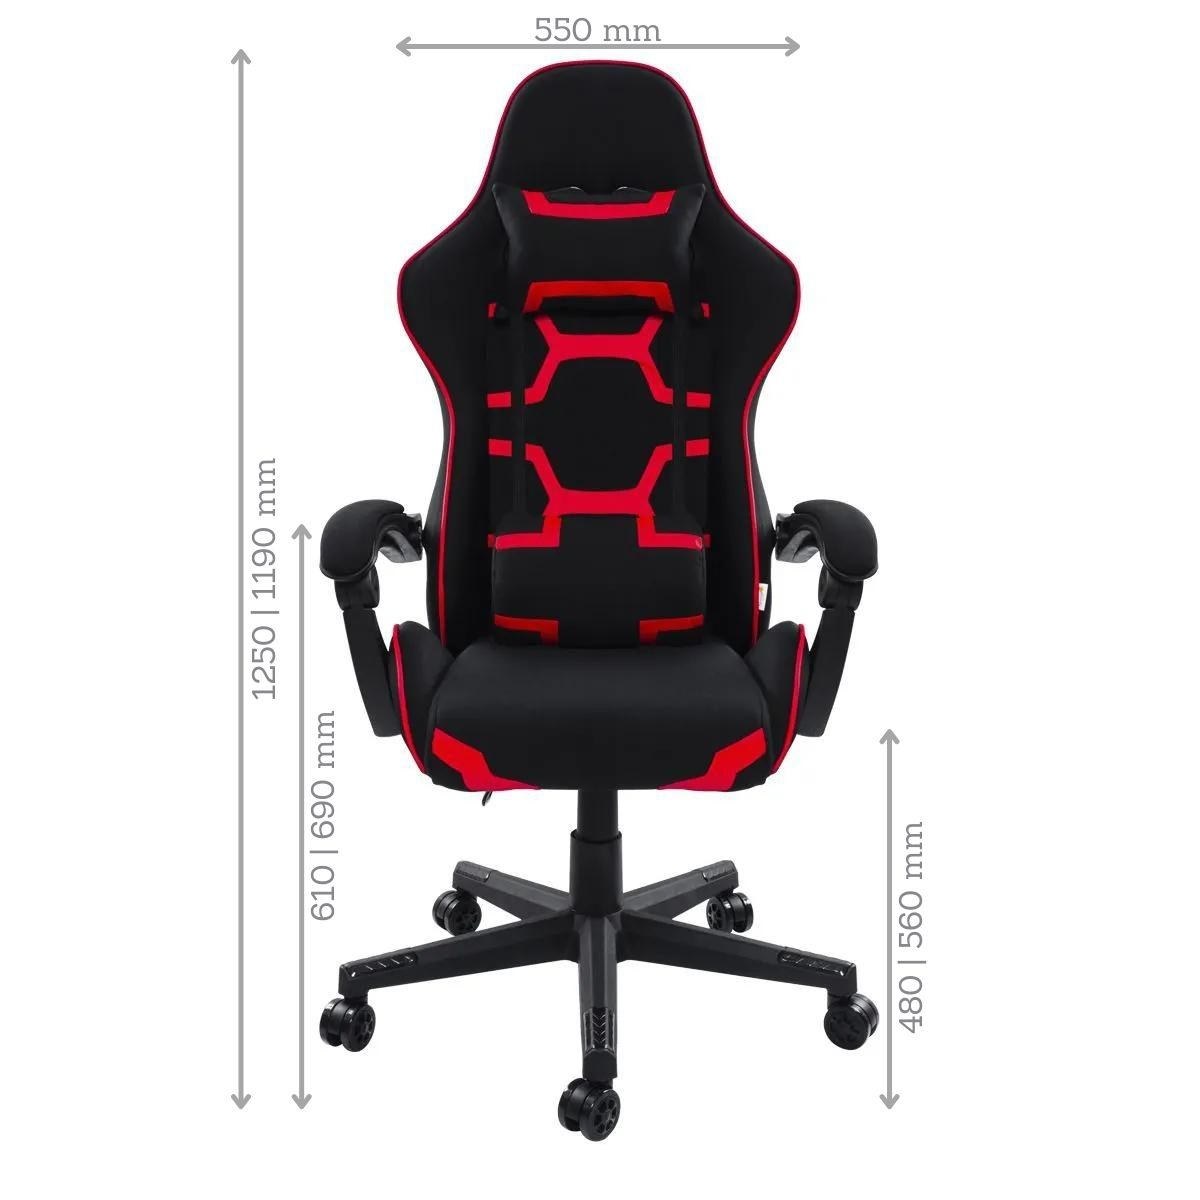 Conjunto Mesa Gamer Pelegrin PEL-003P Preta e Vermelha e Cadeira Gamer Pelegrin PEL-3018 Vermelha